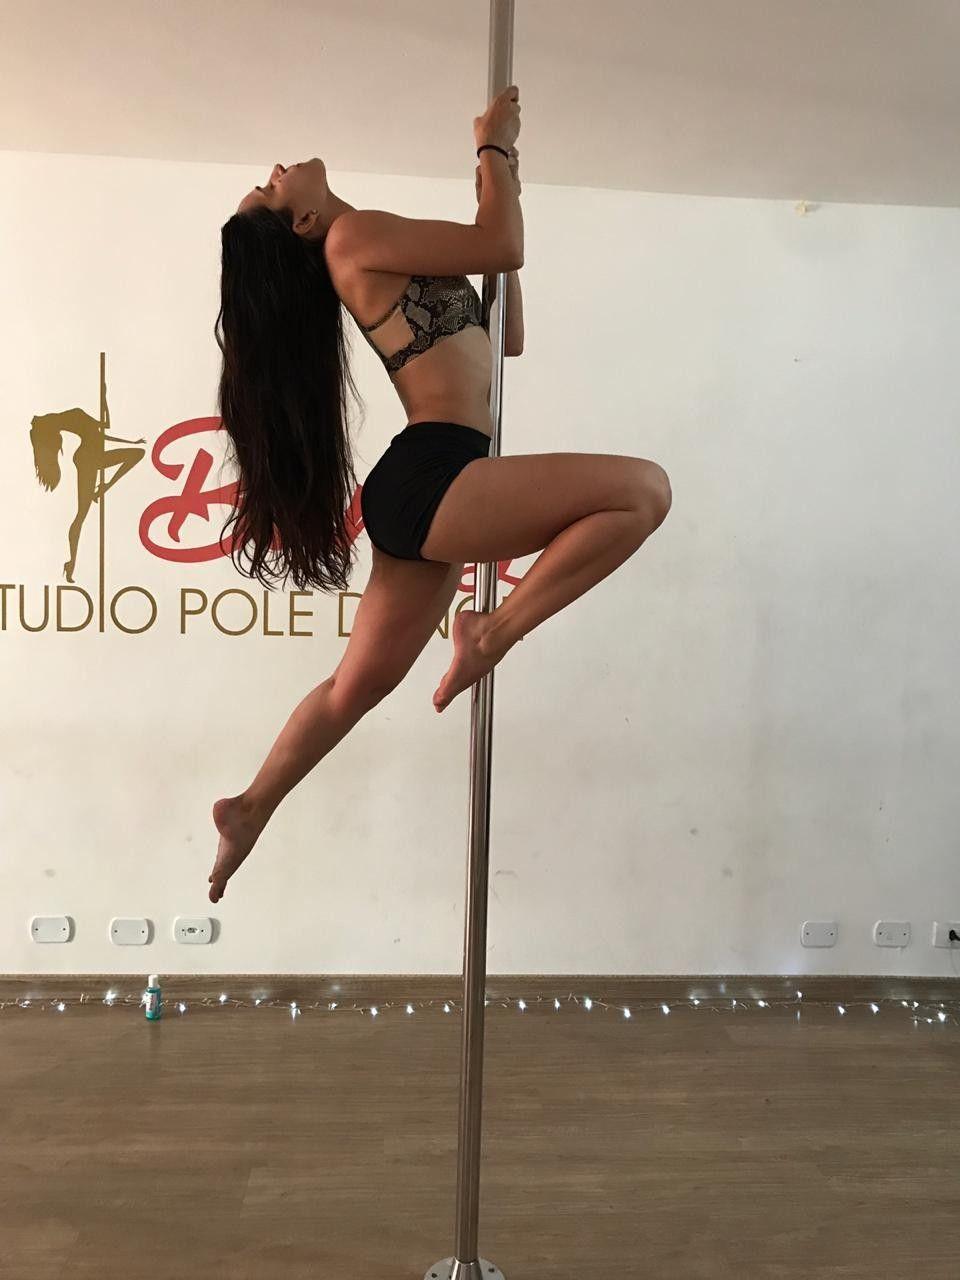 Pole Dance Move Pole Poses Photo Shoots Pole Dancing Pole Dancing Fitness